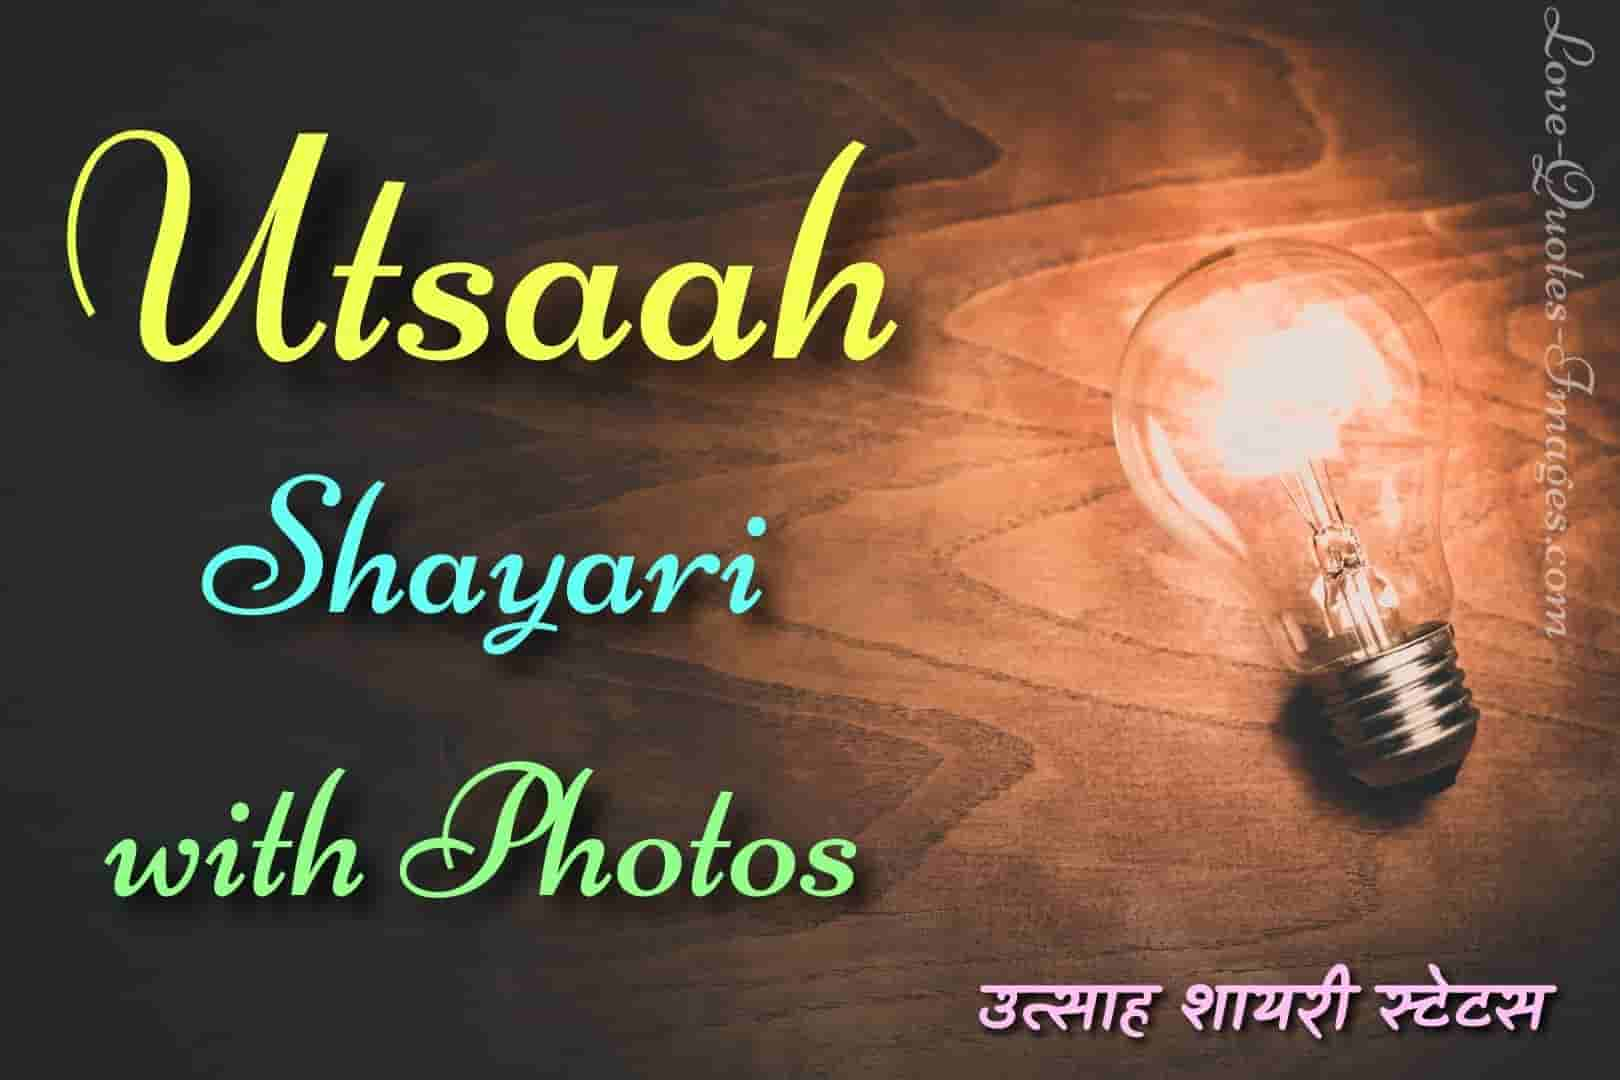 Utsaah shayari in Hindi